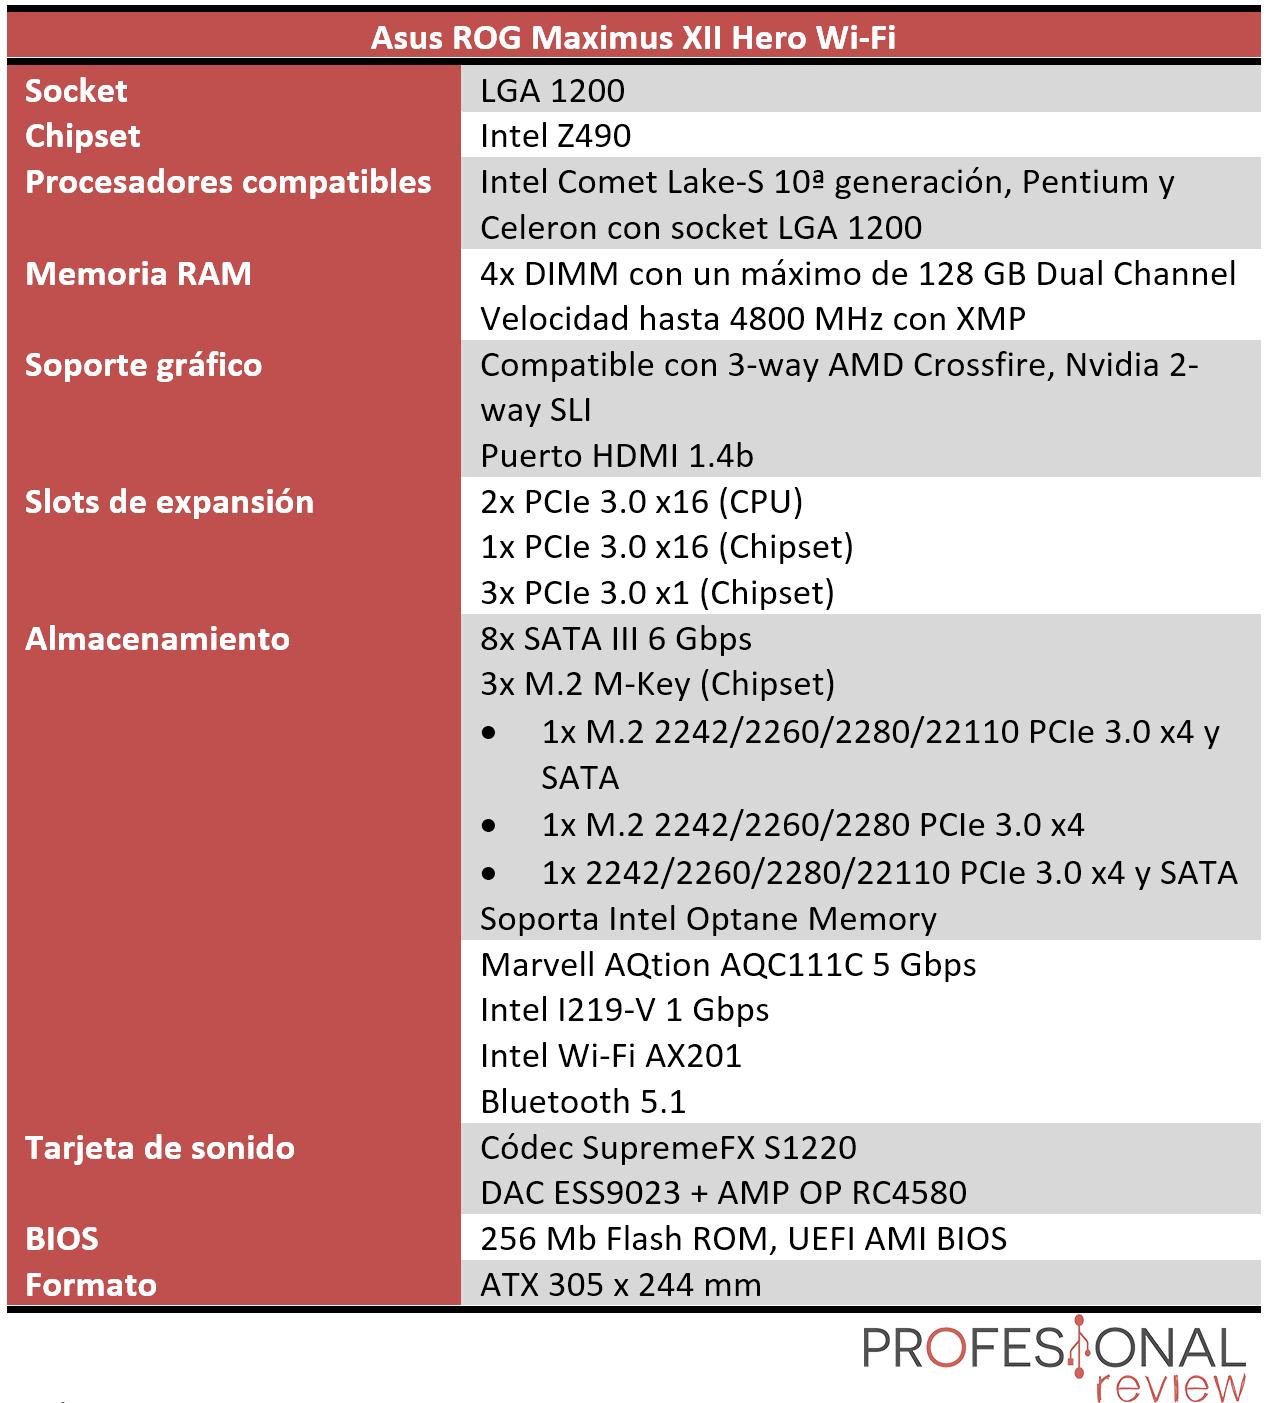 Asus ROG Maximus XII Hero Wi-Fi características